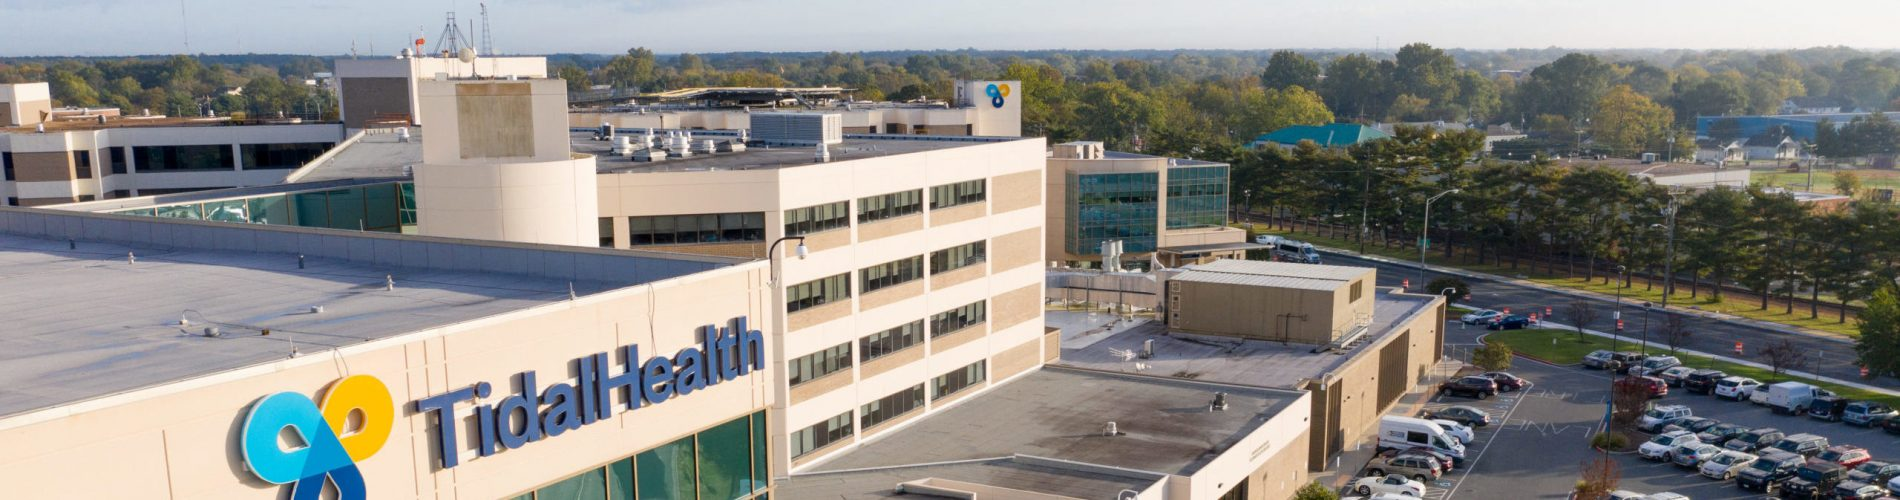 Aerial Photo of TidalHealth Peninsula Regional Medical Center